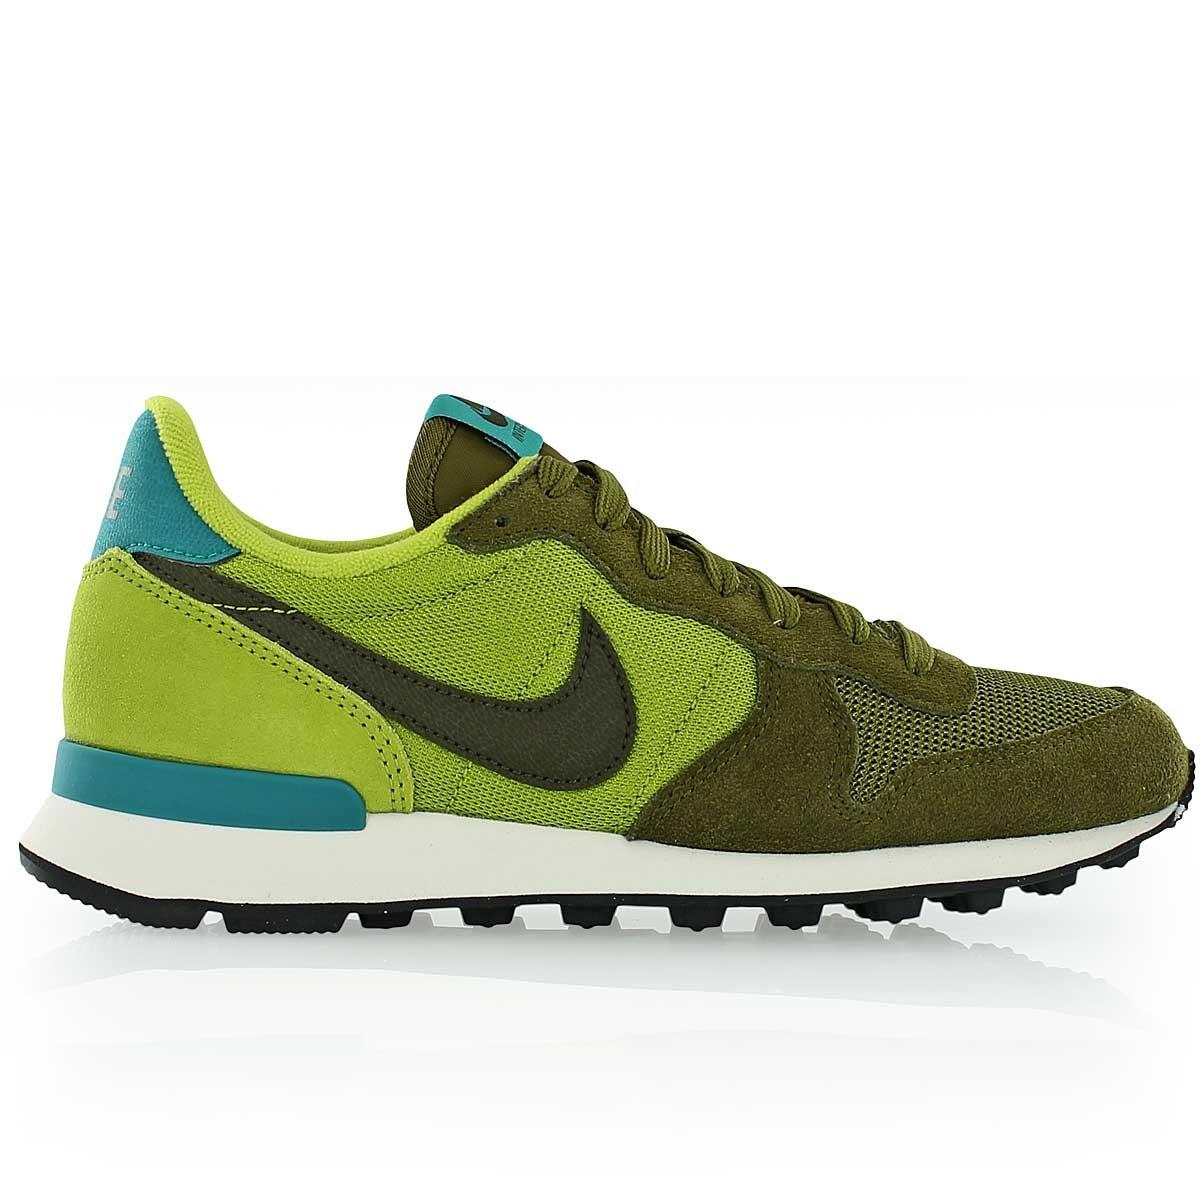 best service 9c8a3 7e204 Nike Inernationalist Women s Running Sneaker (5.5, Green)  Amazon.co.uk   Shoes   Bags